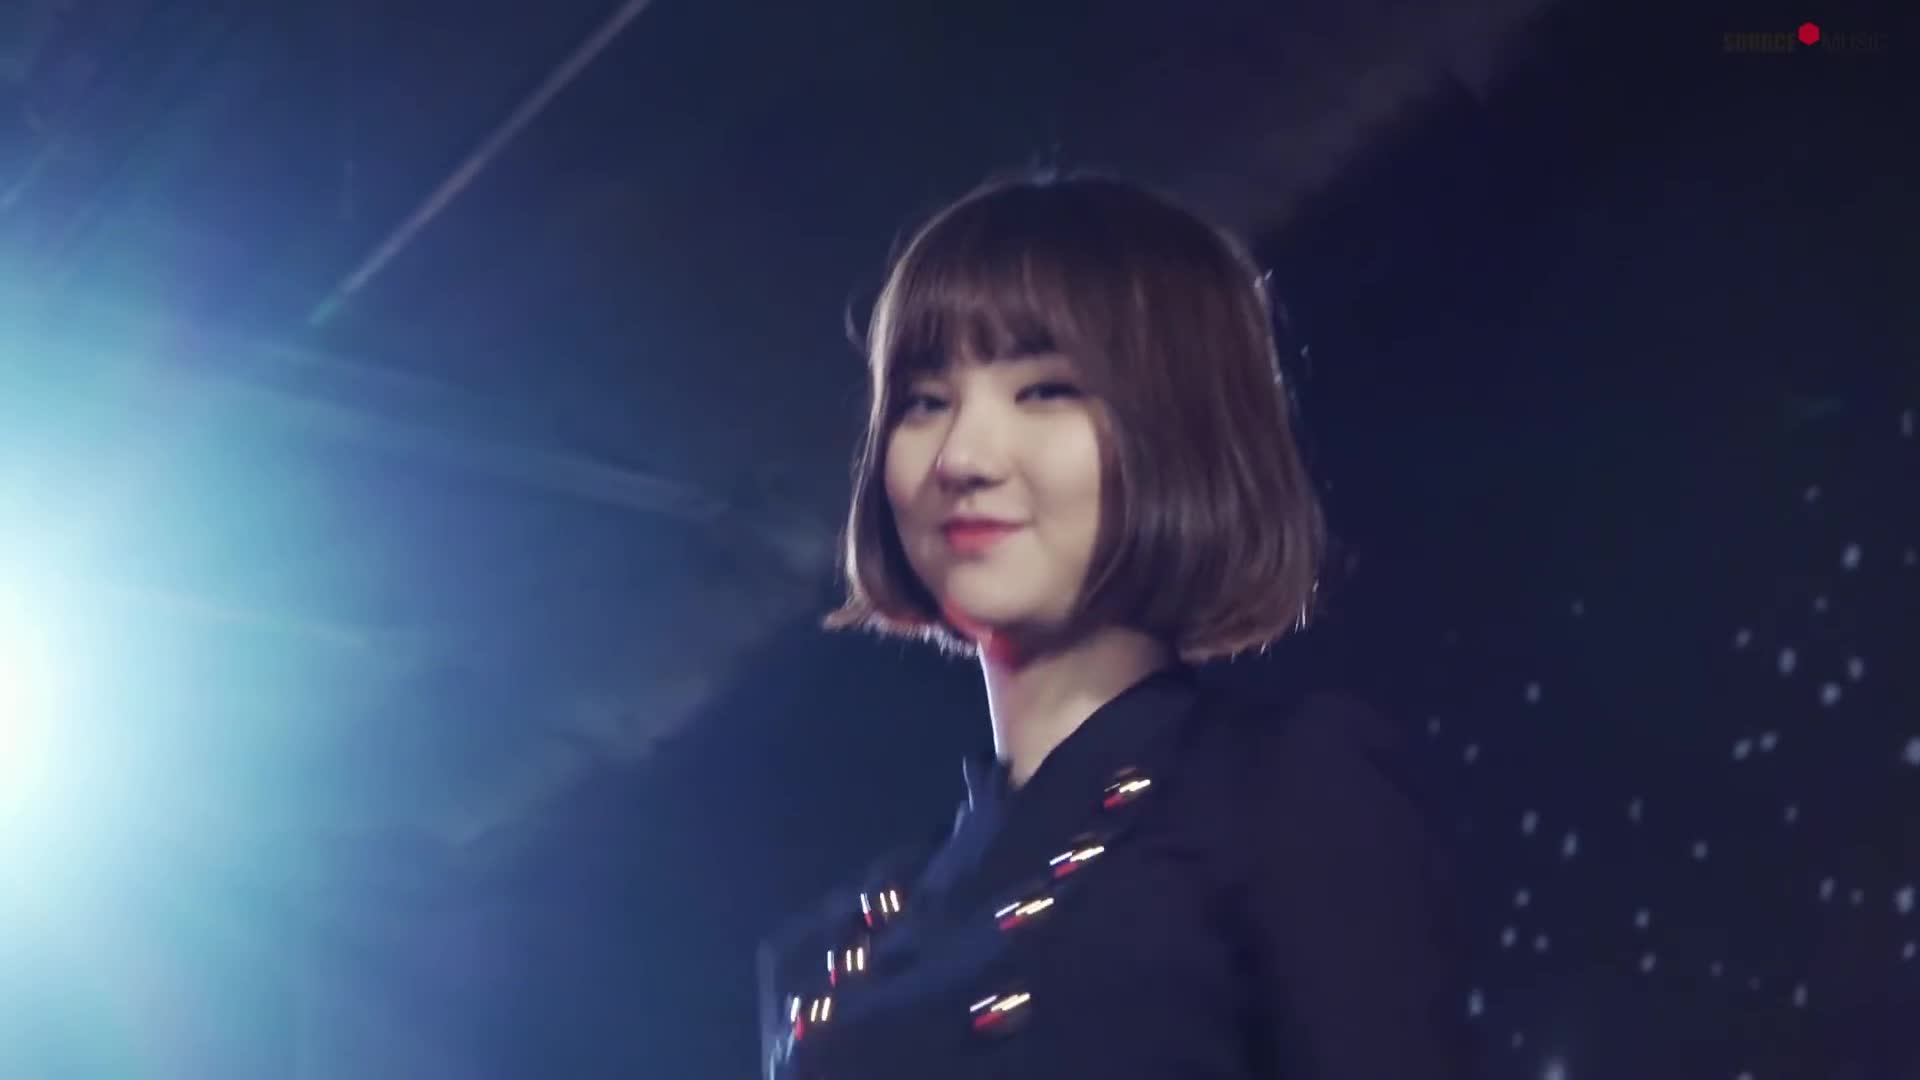 gfriend, sowon, yerin, 소원, 신비, 엄지, 여자친구, 예린, 유주, 은하, finger guns GIFs